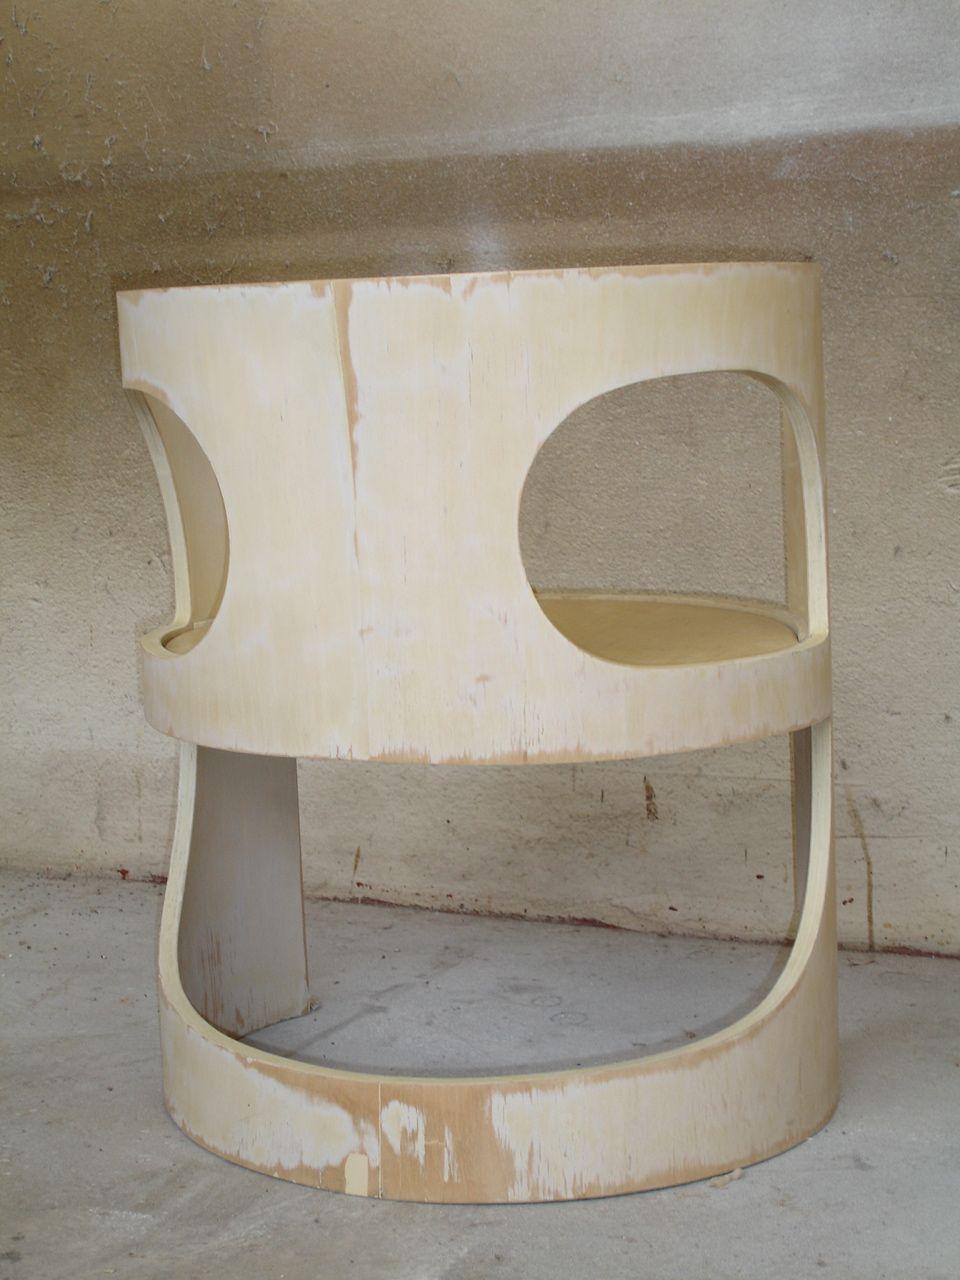 Arne Jacobsen chair before restoration